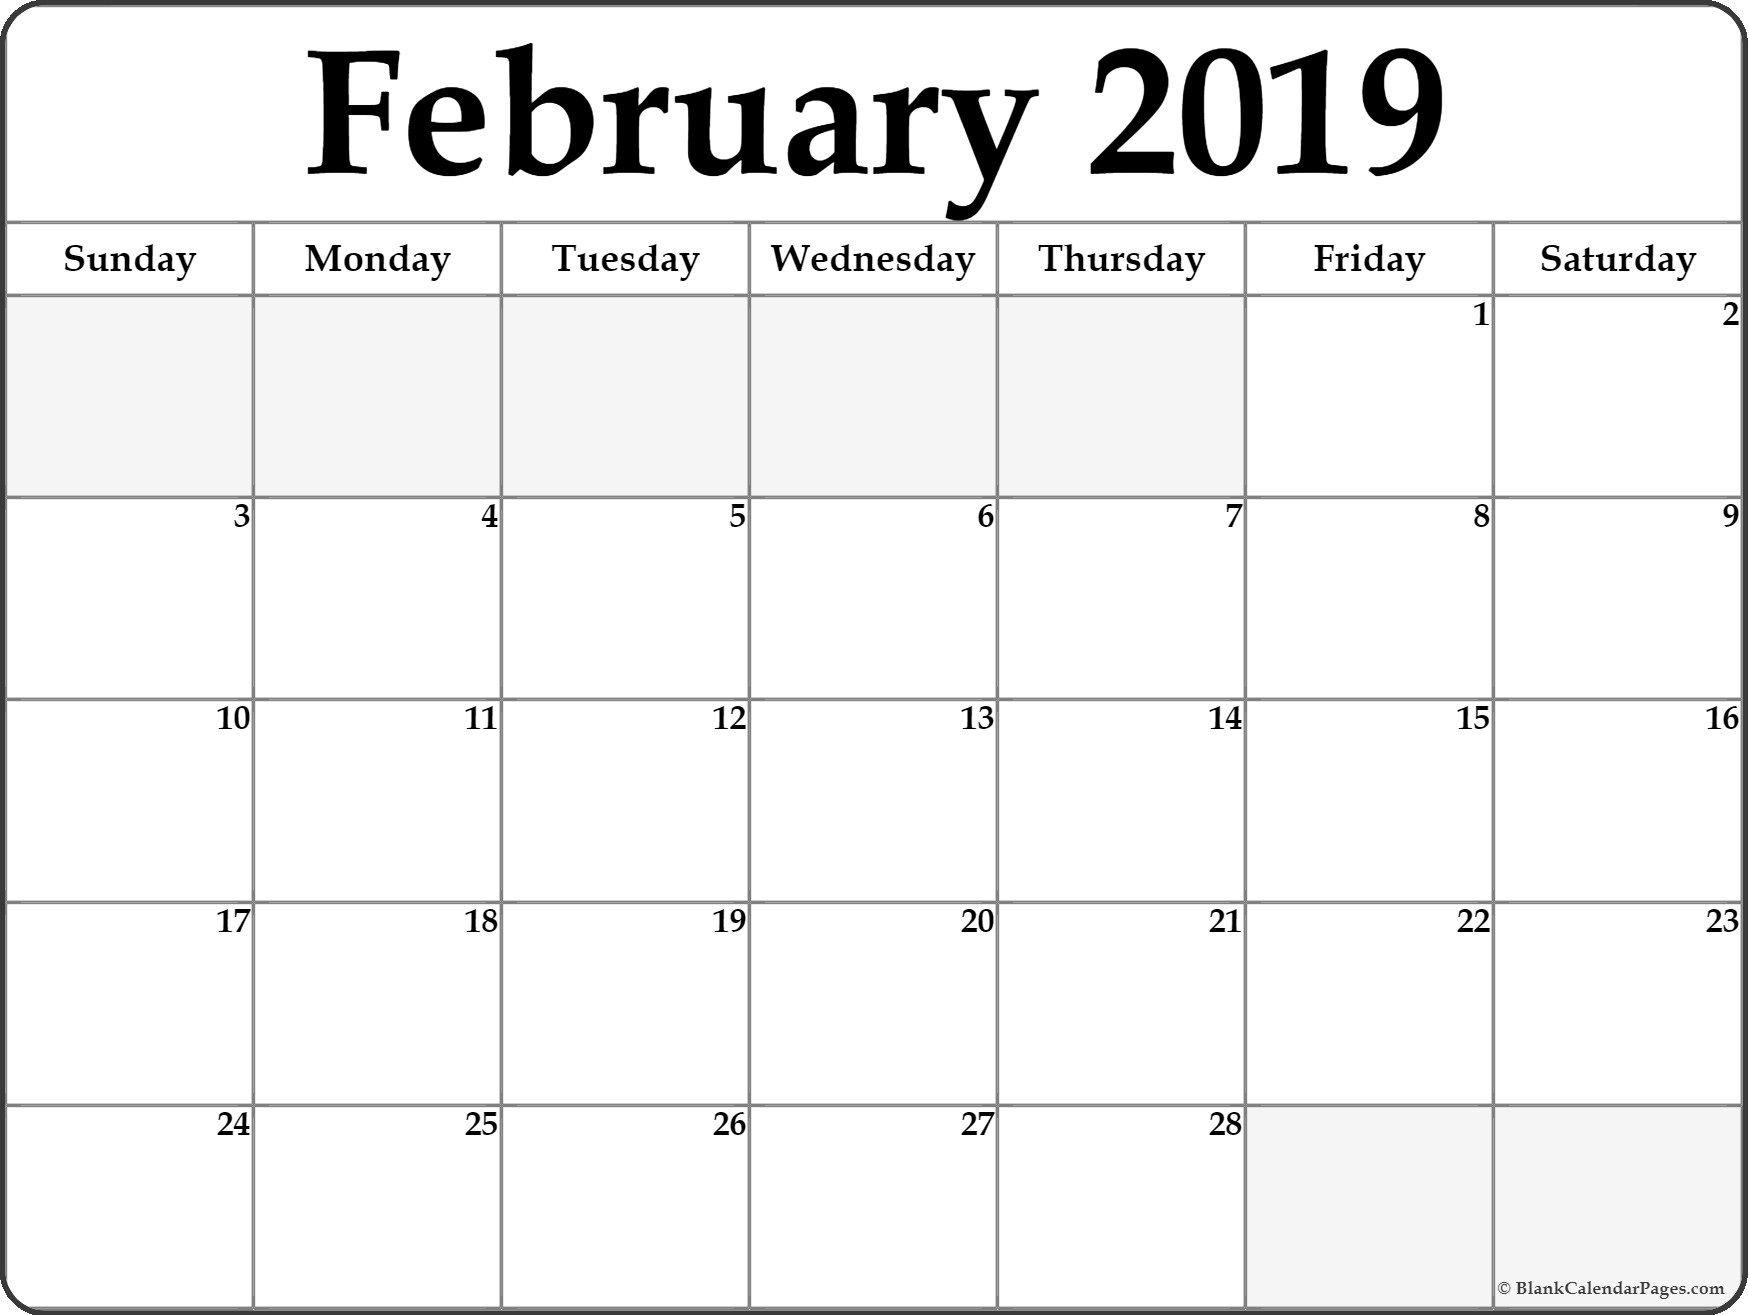 Fillable Monthly Calendar 2019 February 2019 Editable Calendar | Free February 2019 Calendar